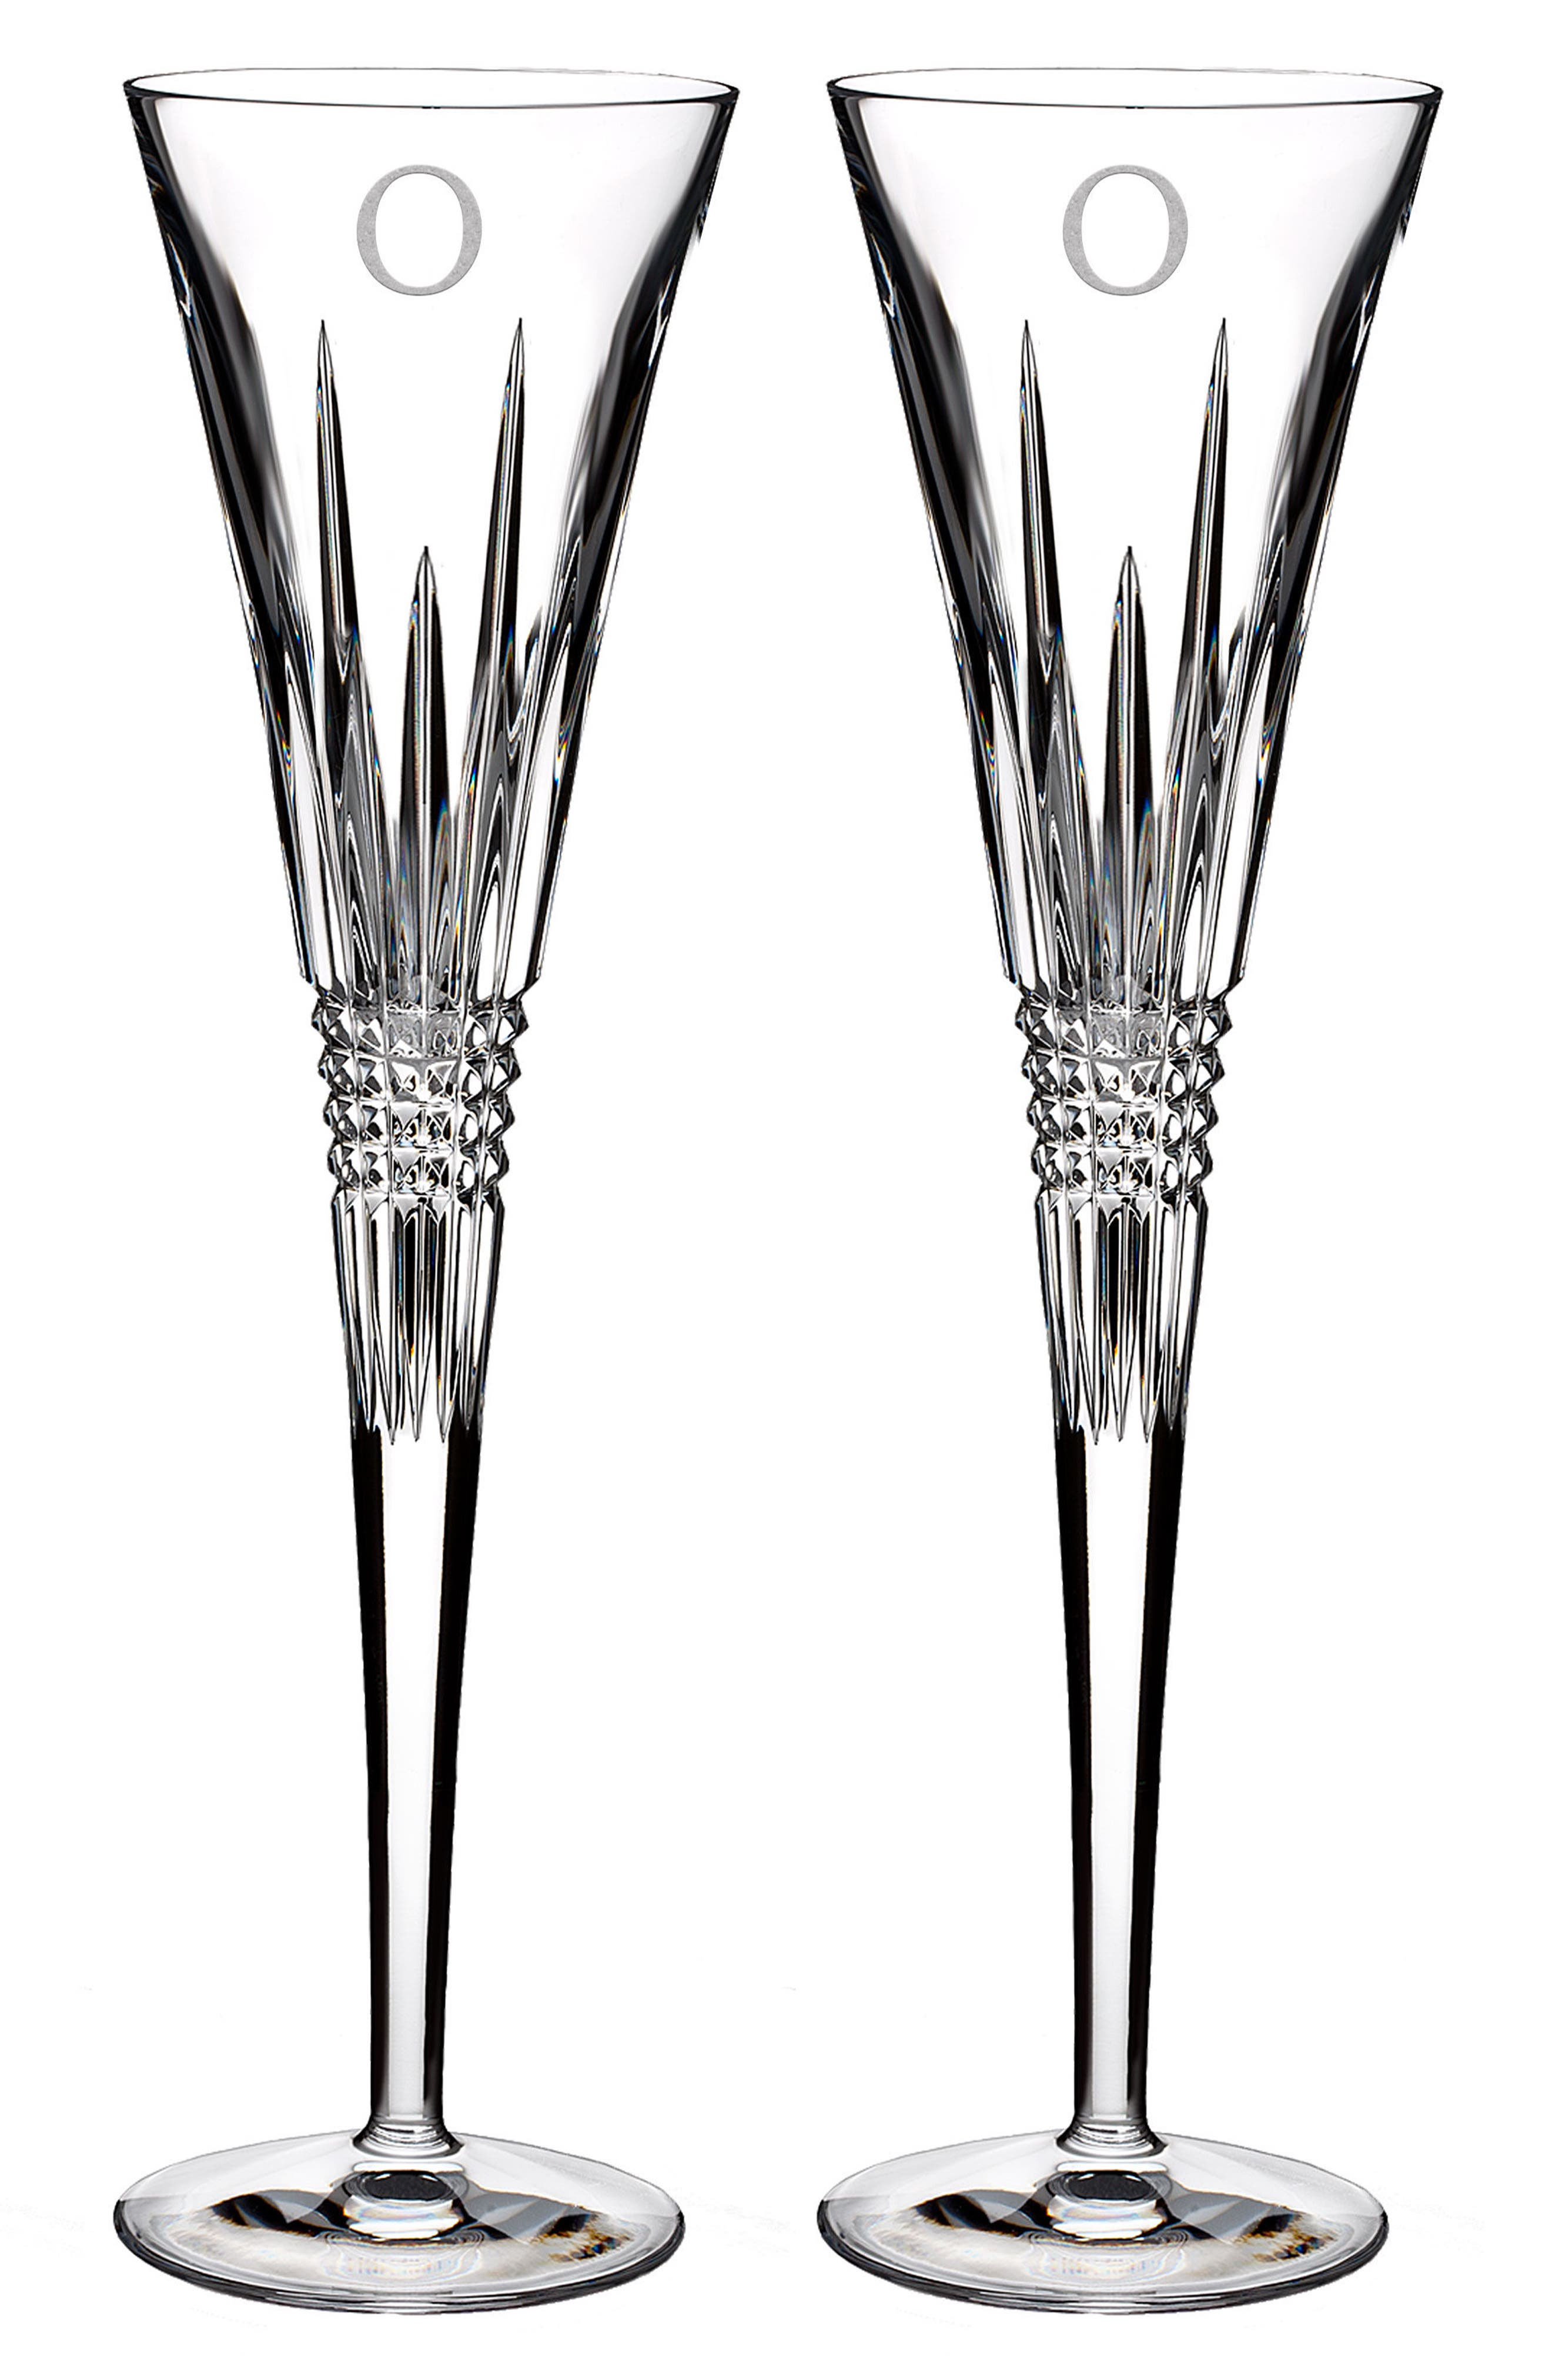 Lismore Diamond Set of 2 Monogram Lead Crystal Champagne Flutes,                             Main thumbnail 1, color,                             Clear - O